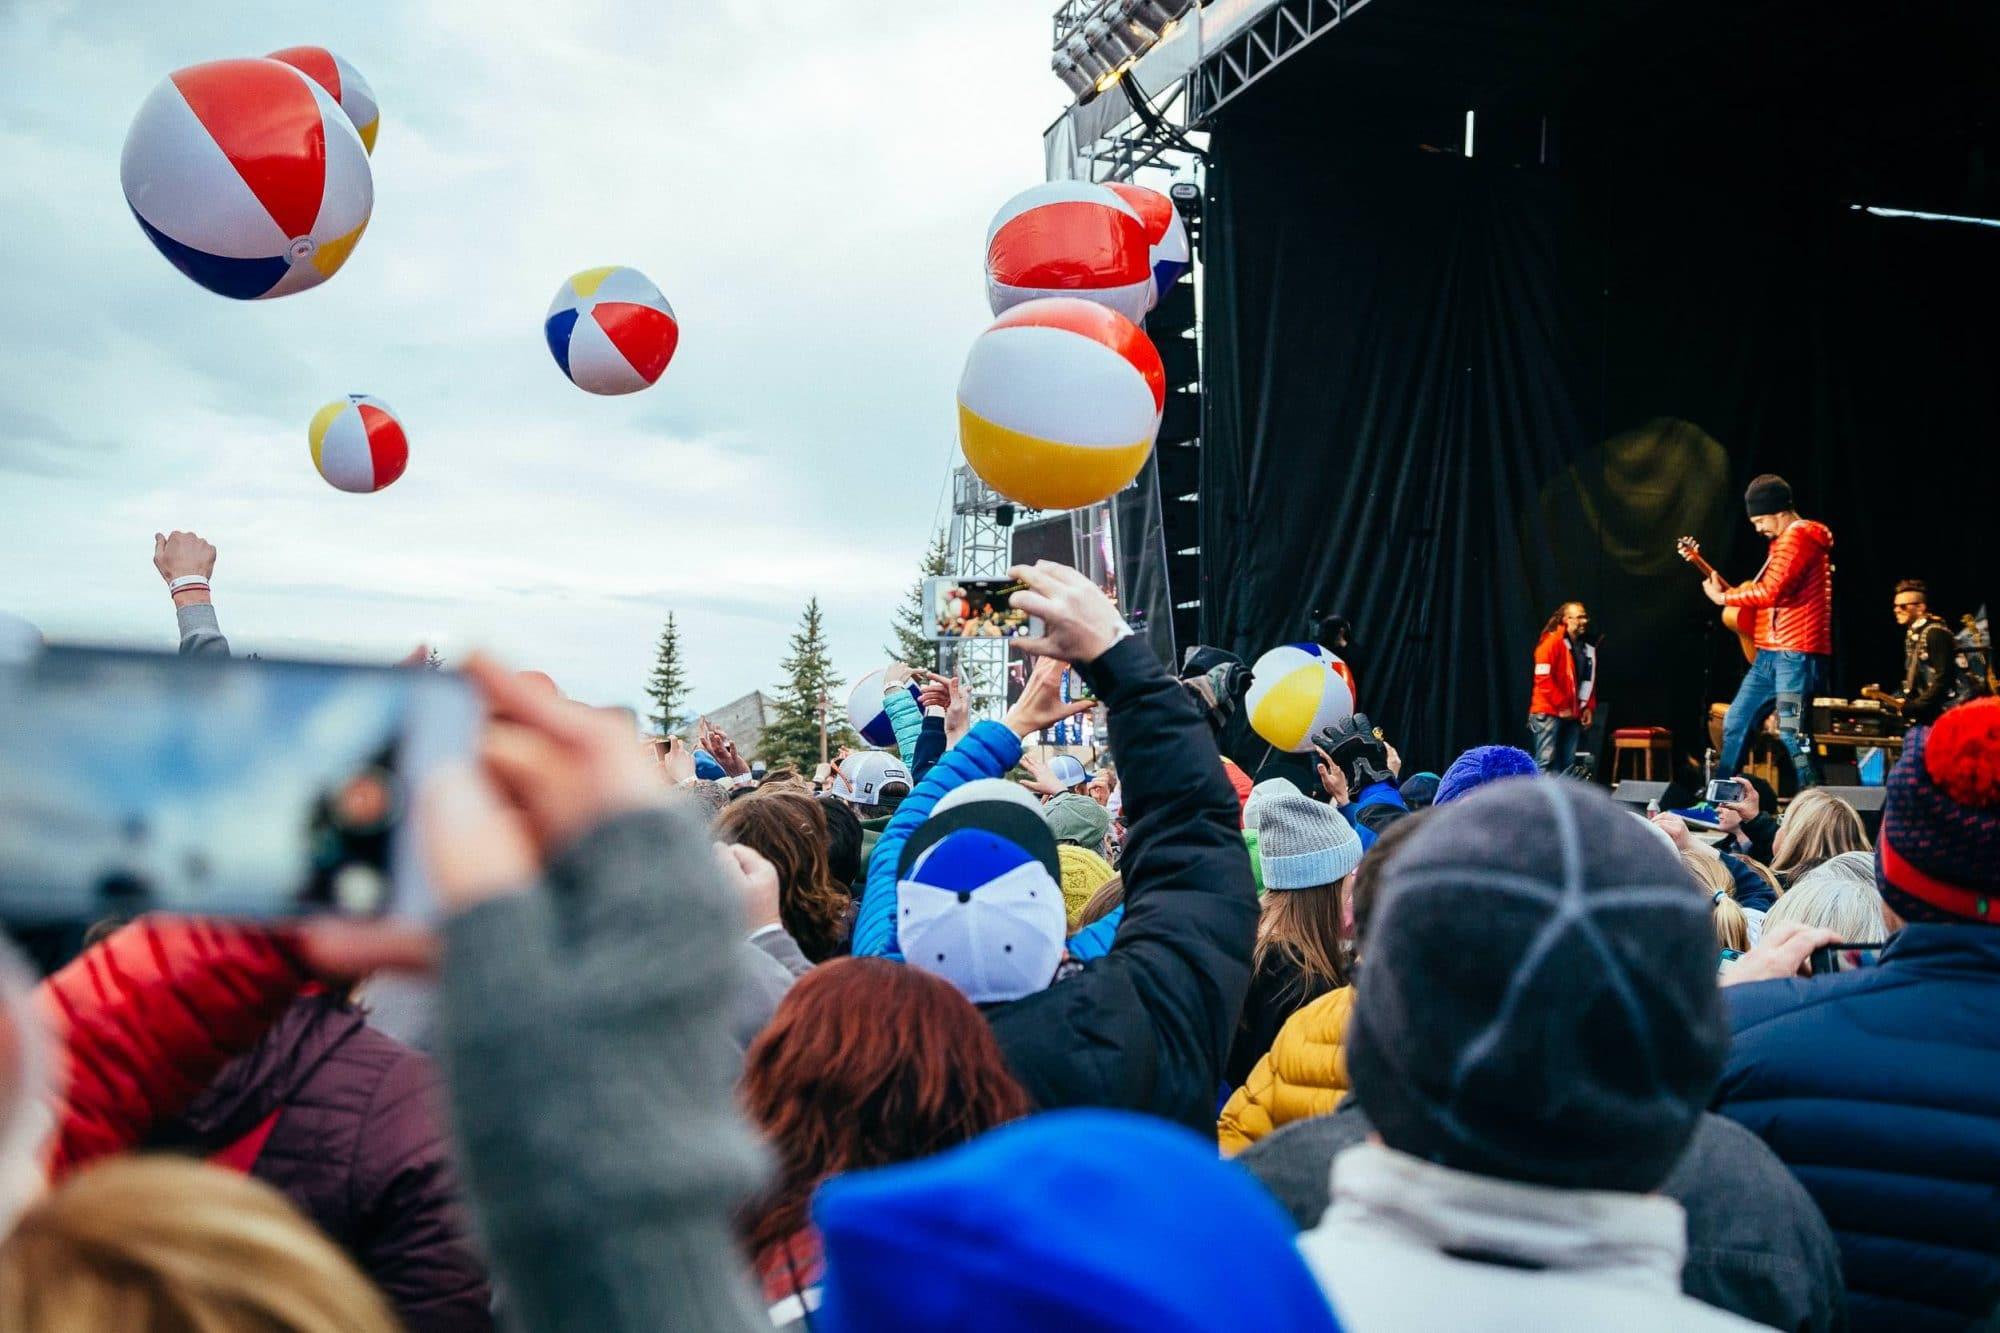 Beach balls bouncing througout the crowd at Michael Franti concert